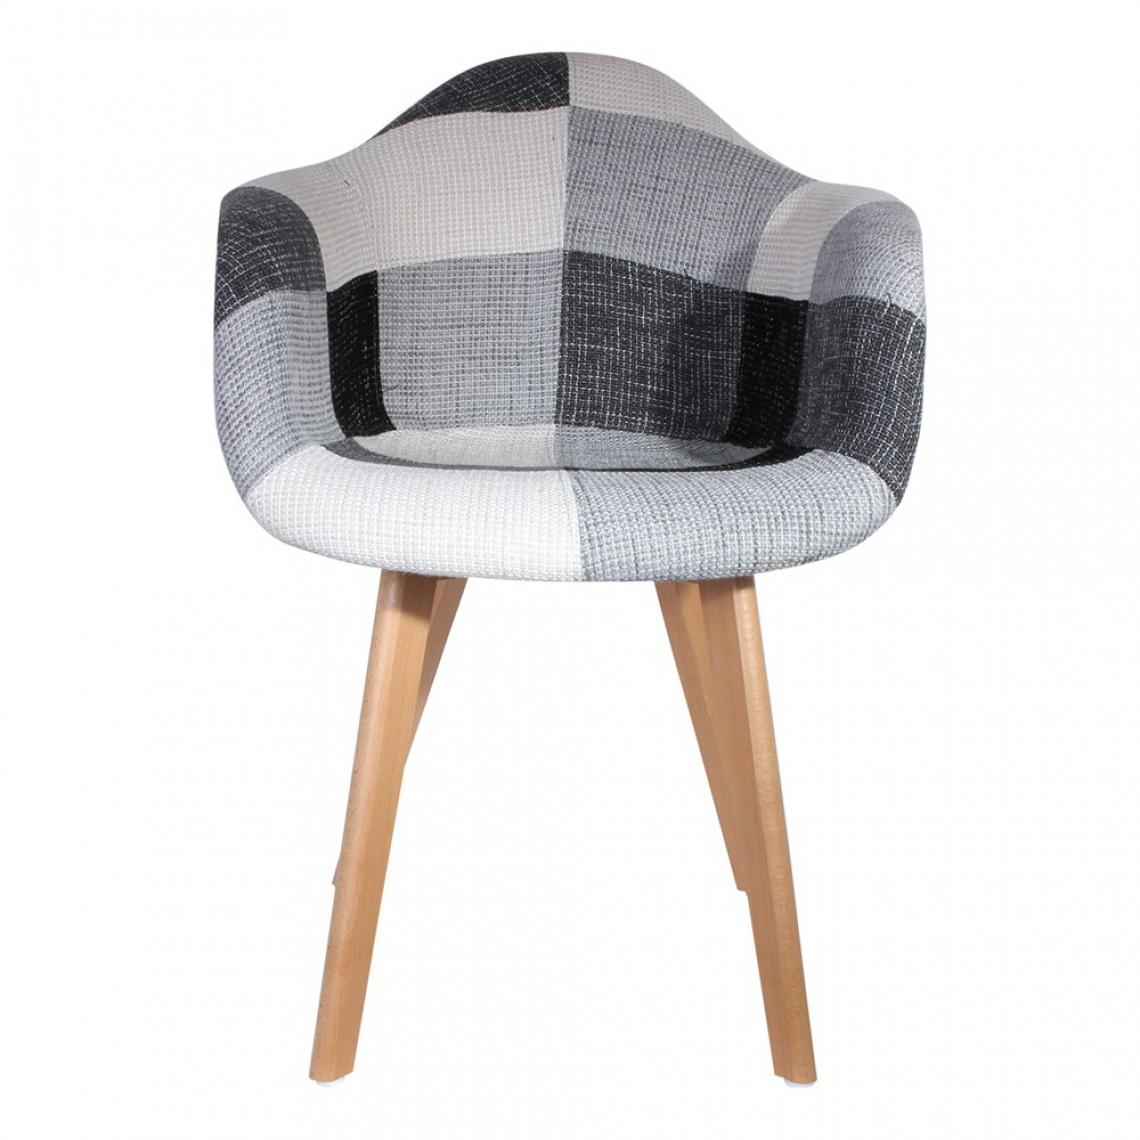 fauteuil scandinave patchwork gris patchy